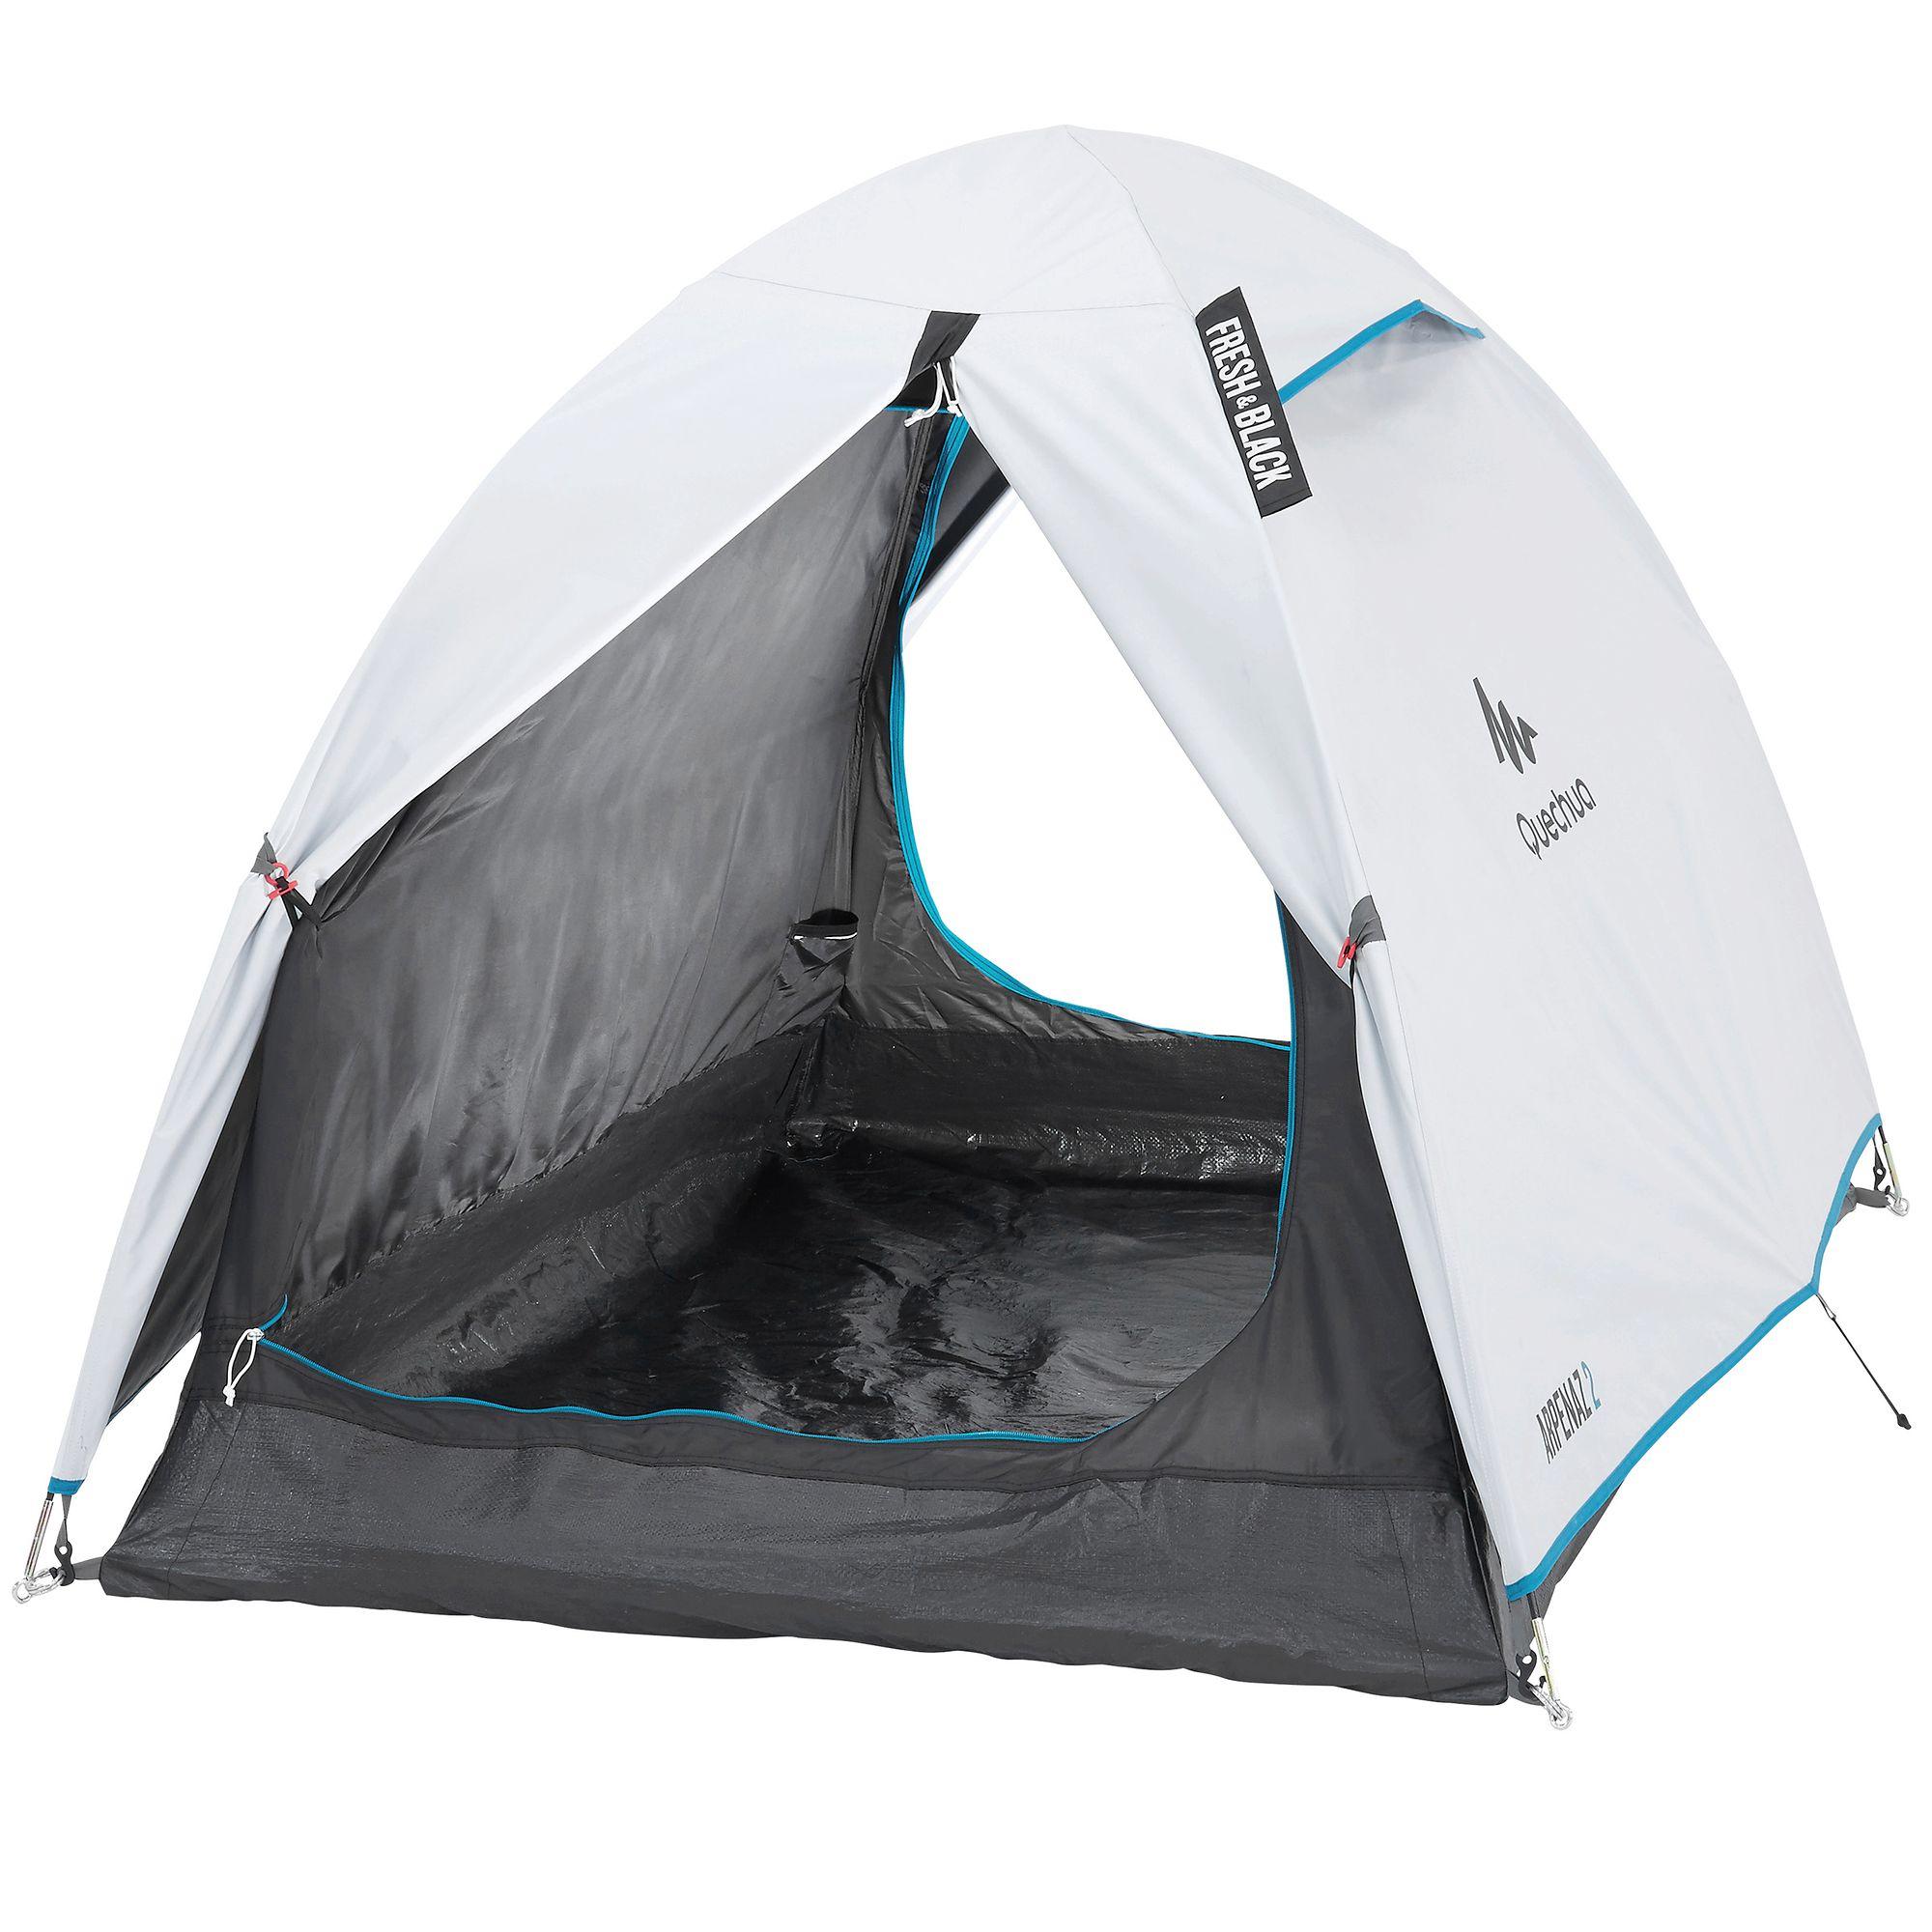 Tente de camping arpenaz 2 personnes fresh&black